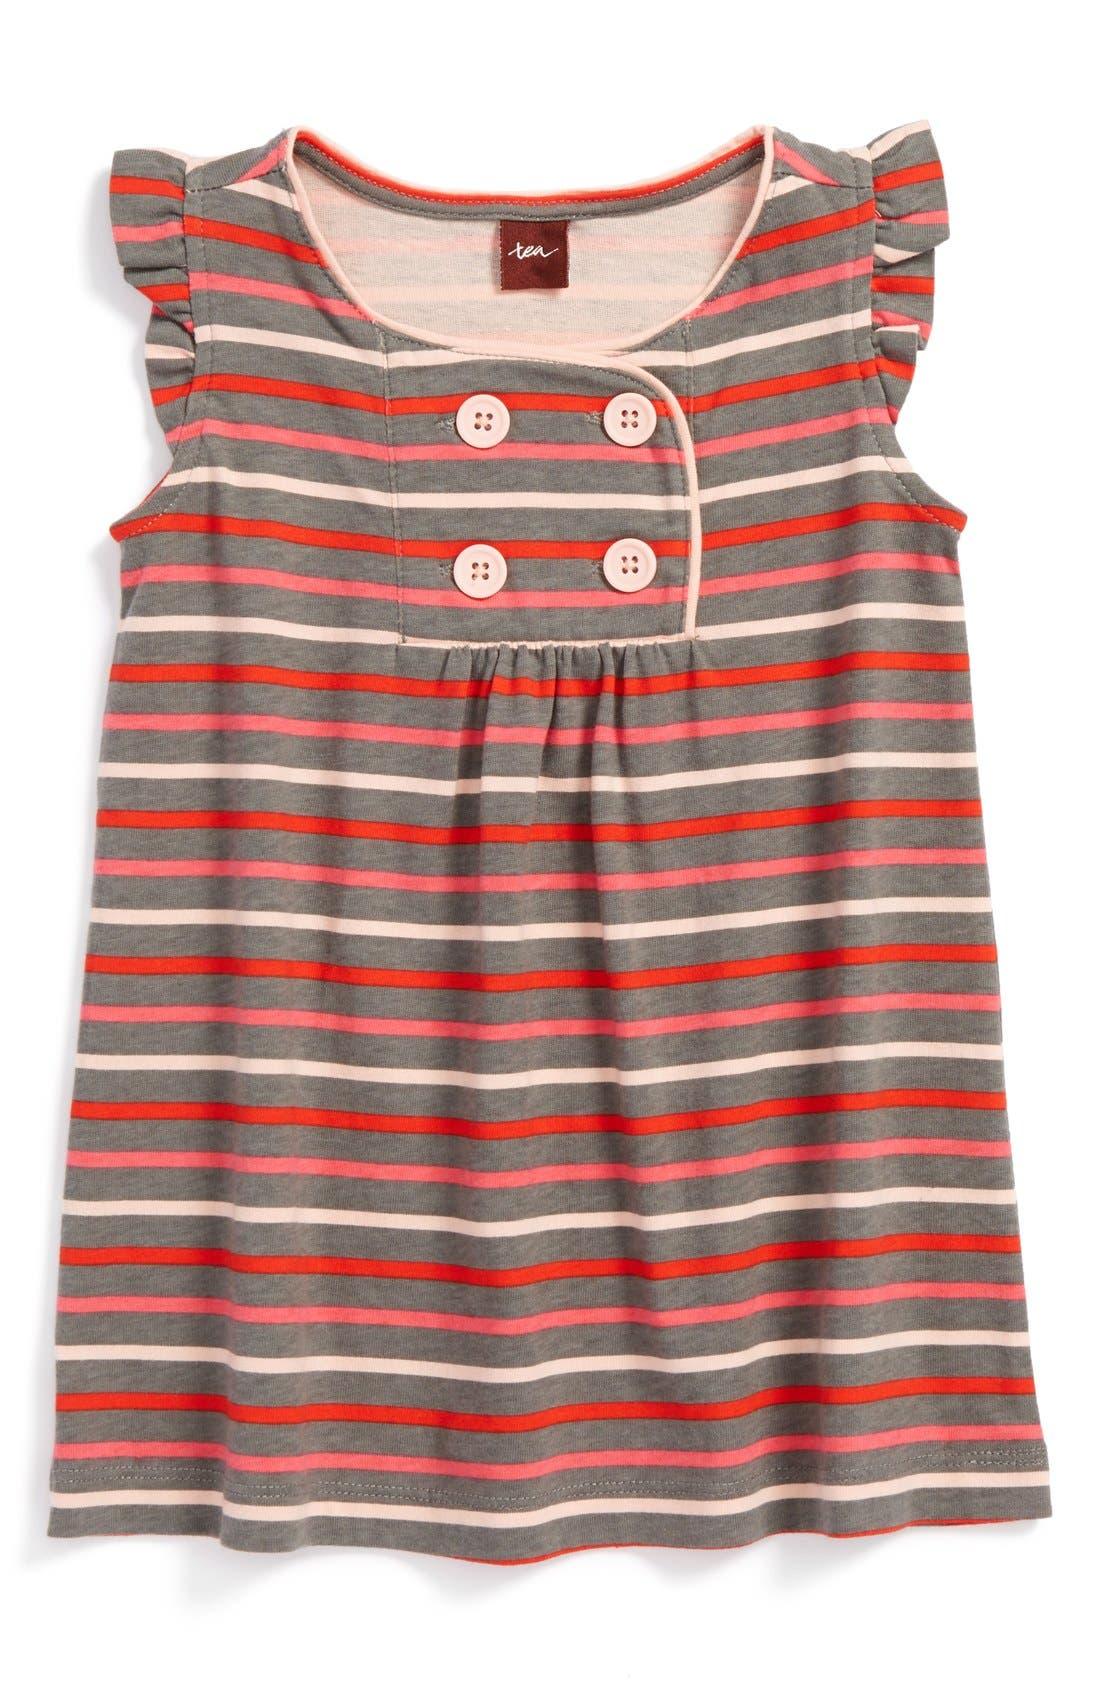 Main Image - Tea Collection 'Altstadt' Stripe Cotton Jersey Dress (Toddler Girls, Little Girls & Big Girls)